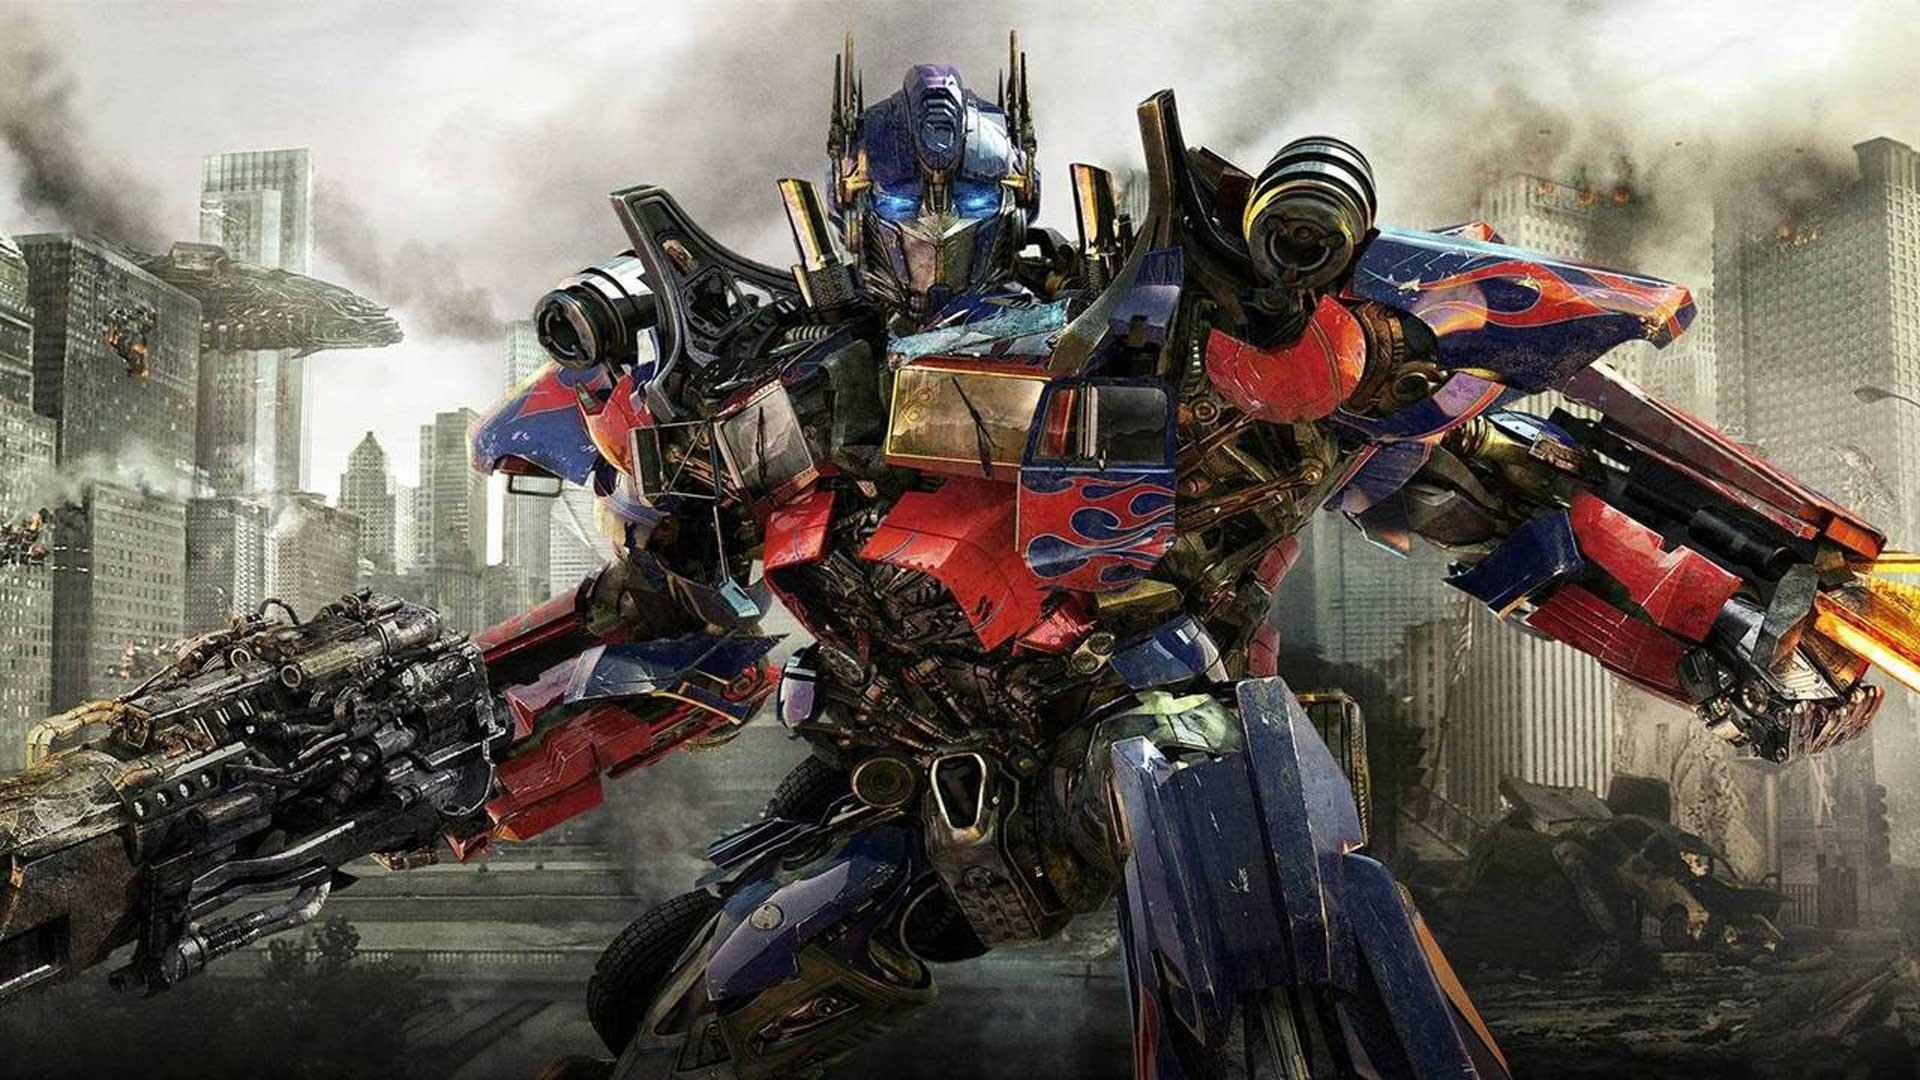 optimus prime transformers age of extinction wallpaper hd